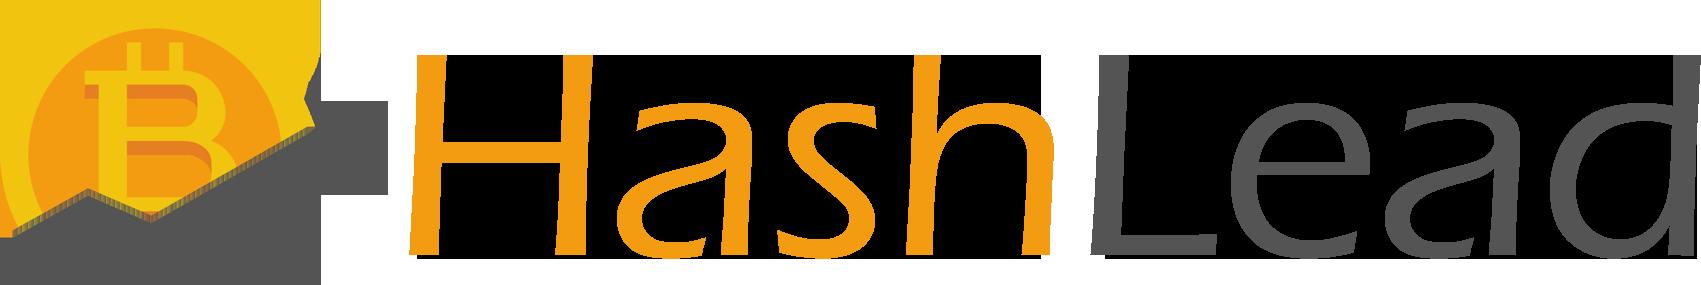 HASHLEAD.COM logo